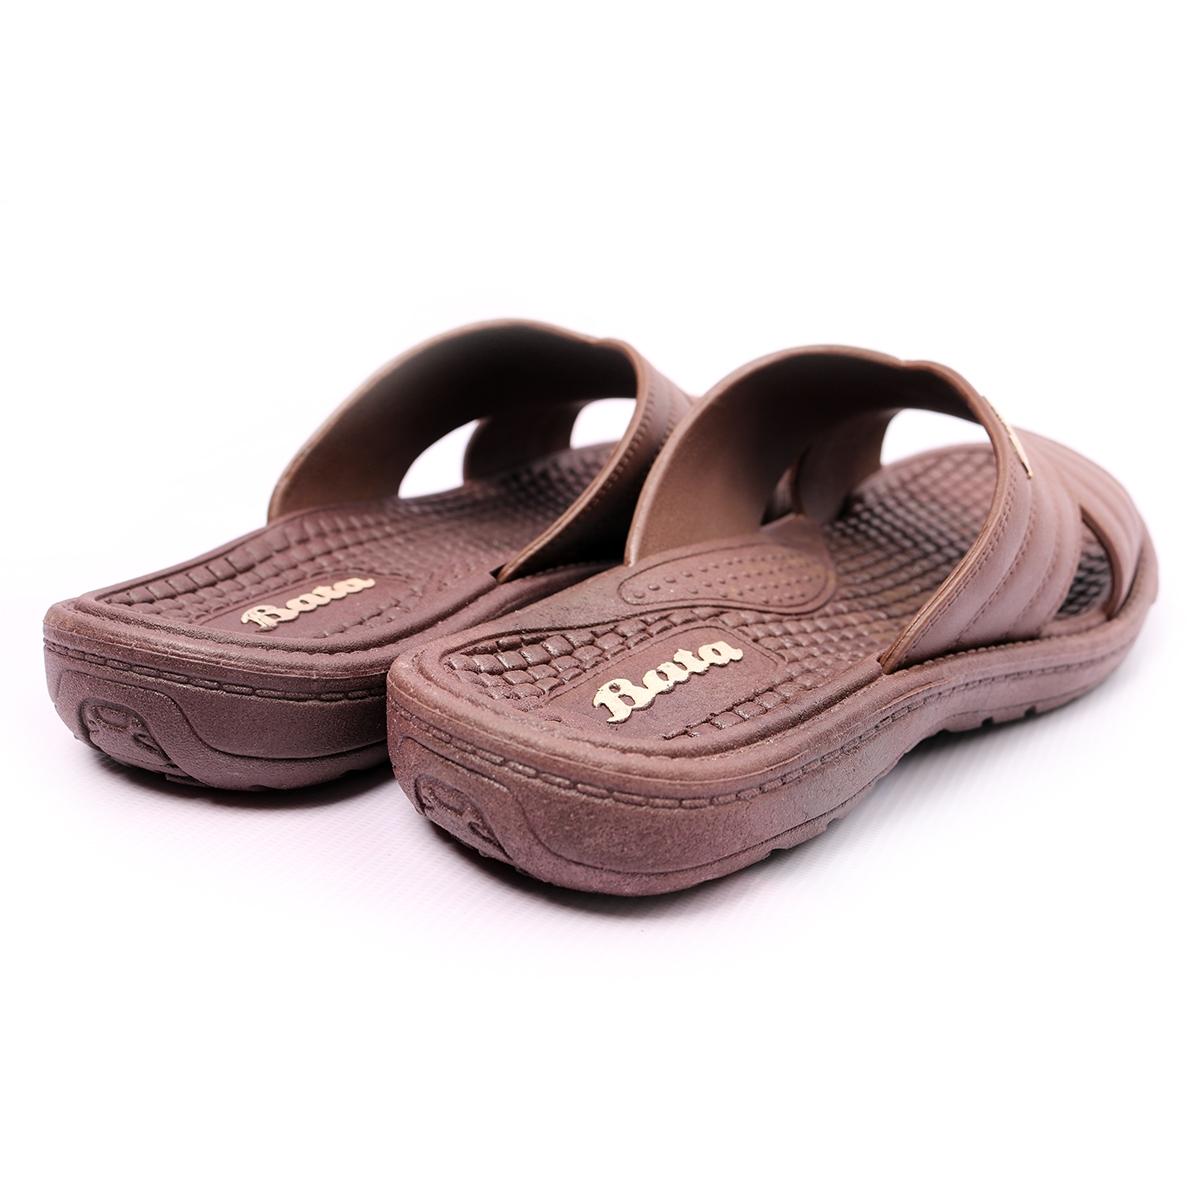 d9aeec7a1c65 Bata Men Simon Brown sandals (872-4217) brown 40   Kilimall Kenya